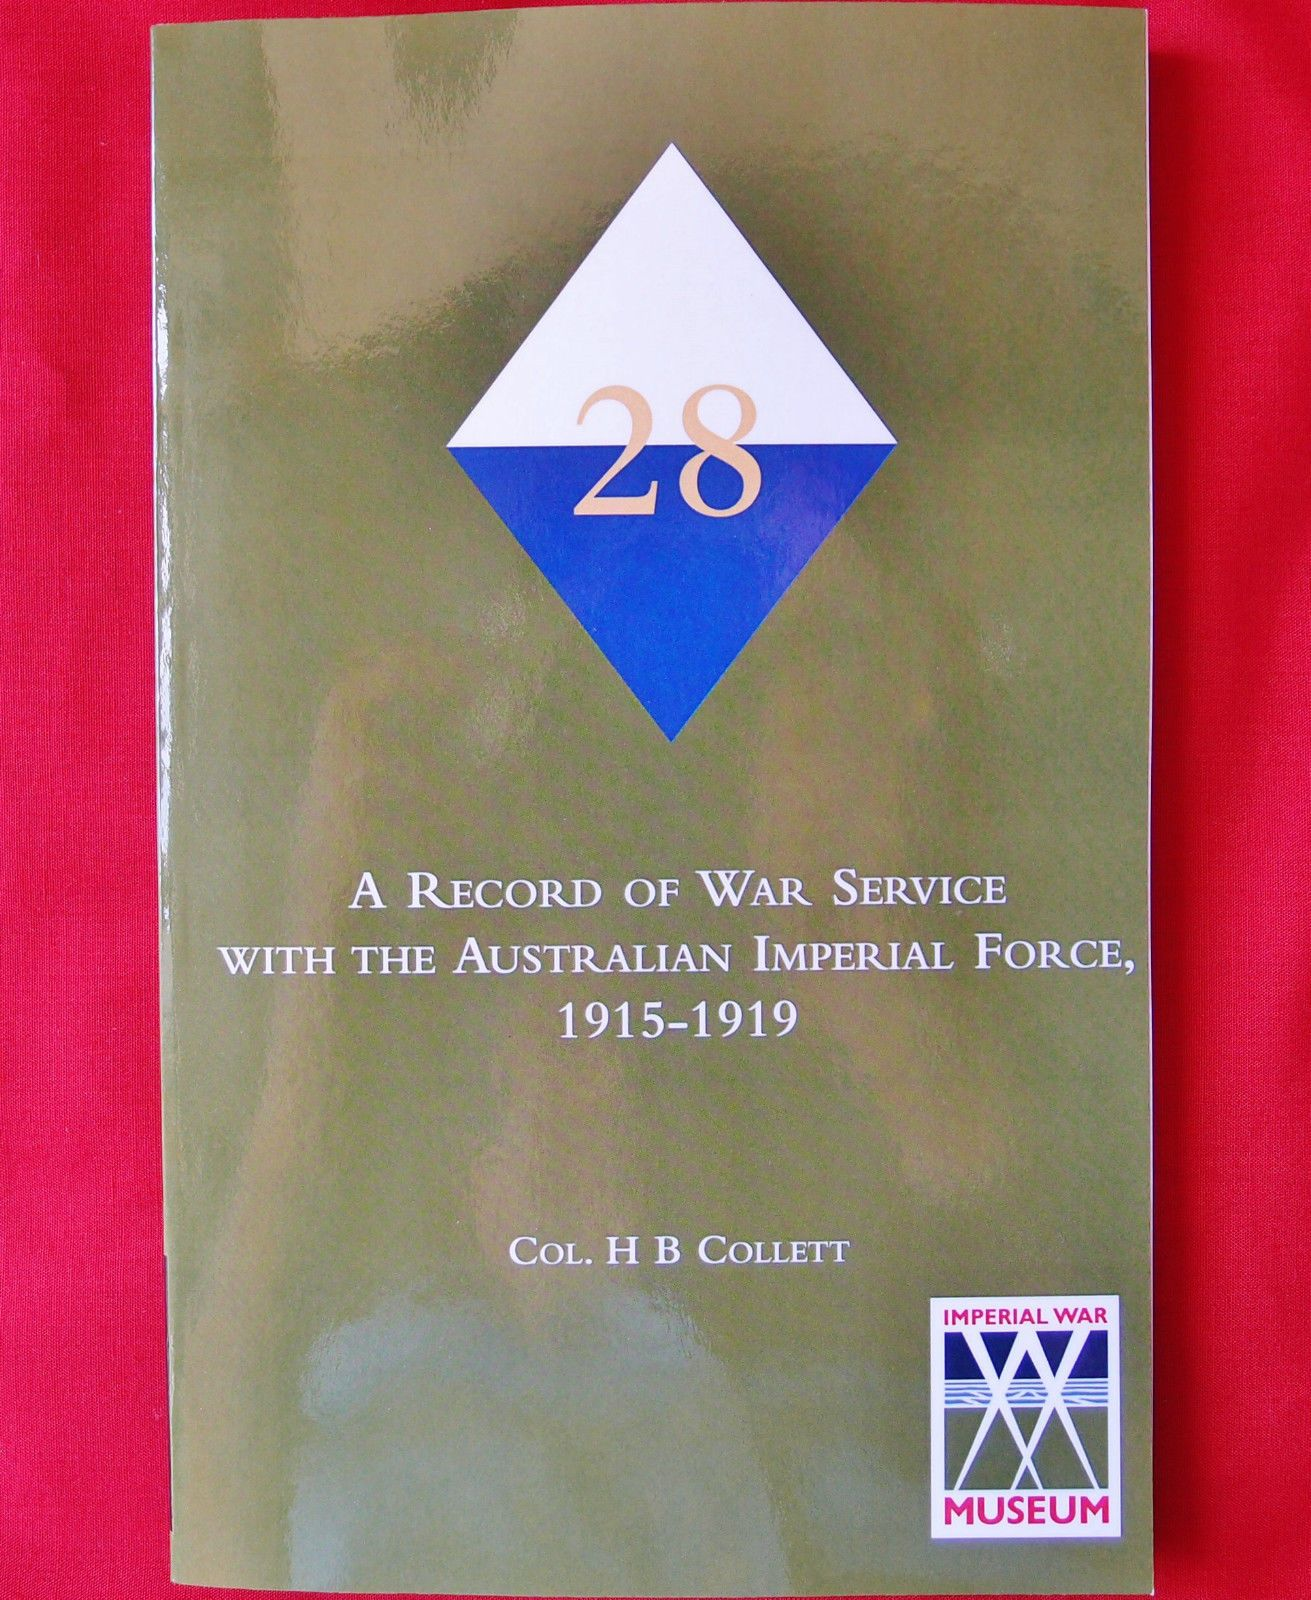 BOOK WW1 28TH BATTALION WESTERN AUSTRALIAN INFANTRY BN ANZAC UNIT HISTORY